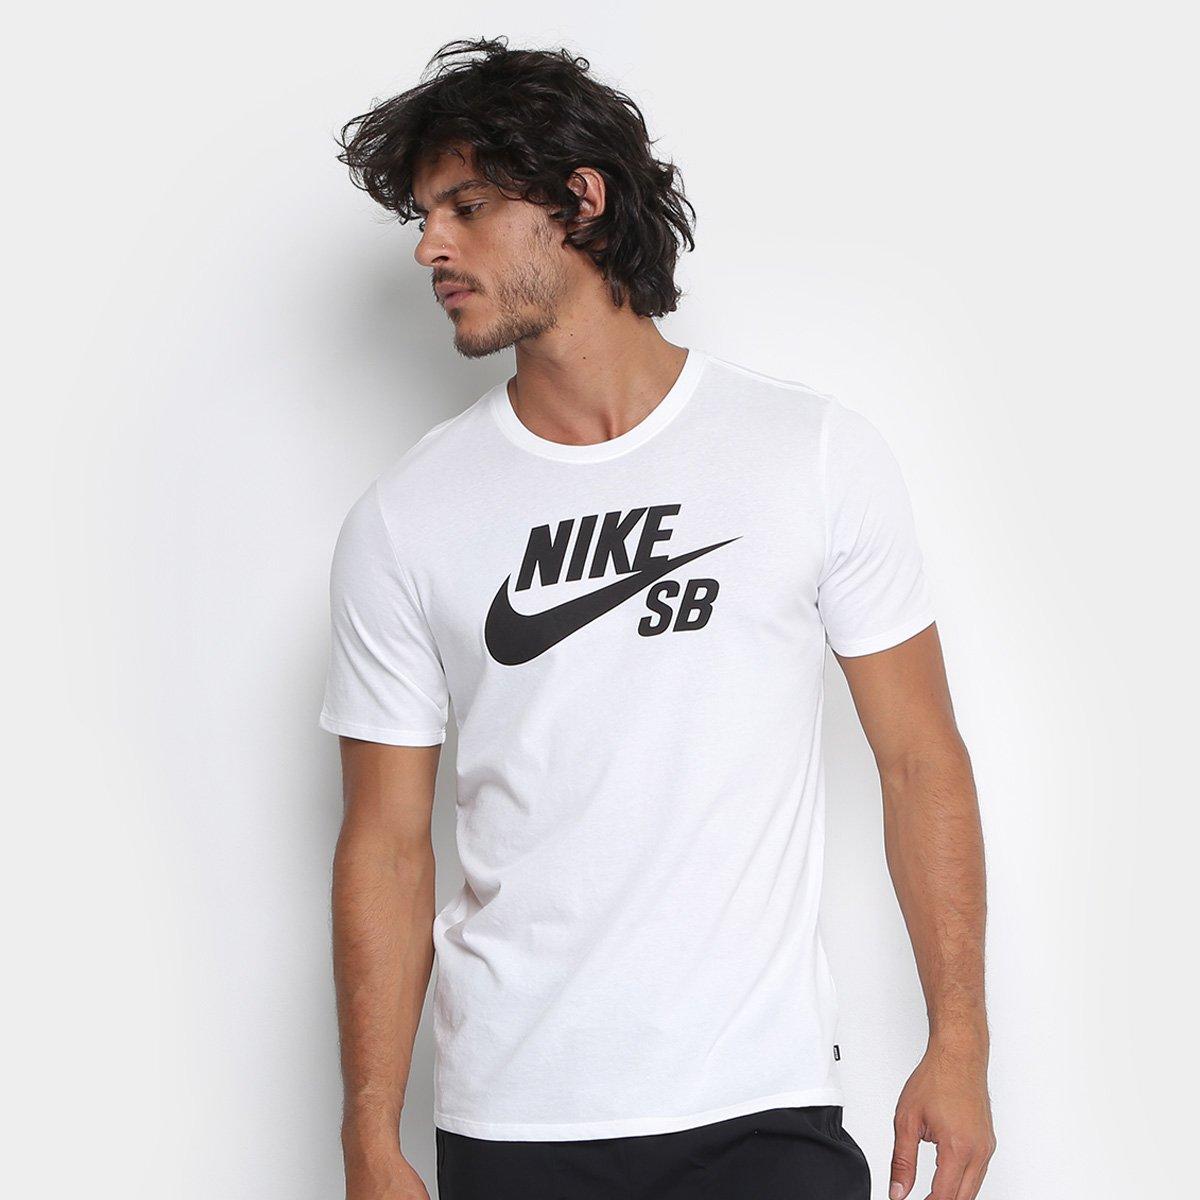 0e3cb04d3e55f Camiseta Nike Sb Logo Masculina - Branco e Preto - Compre Agora ...